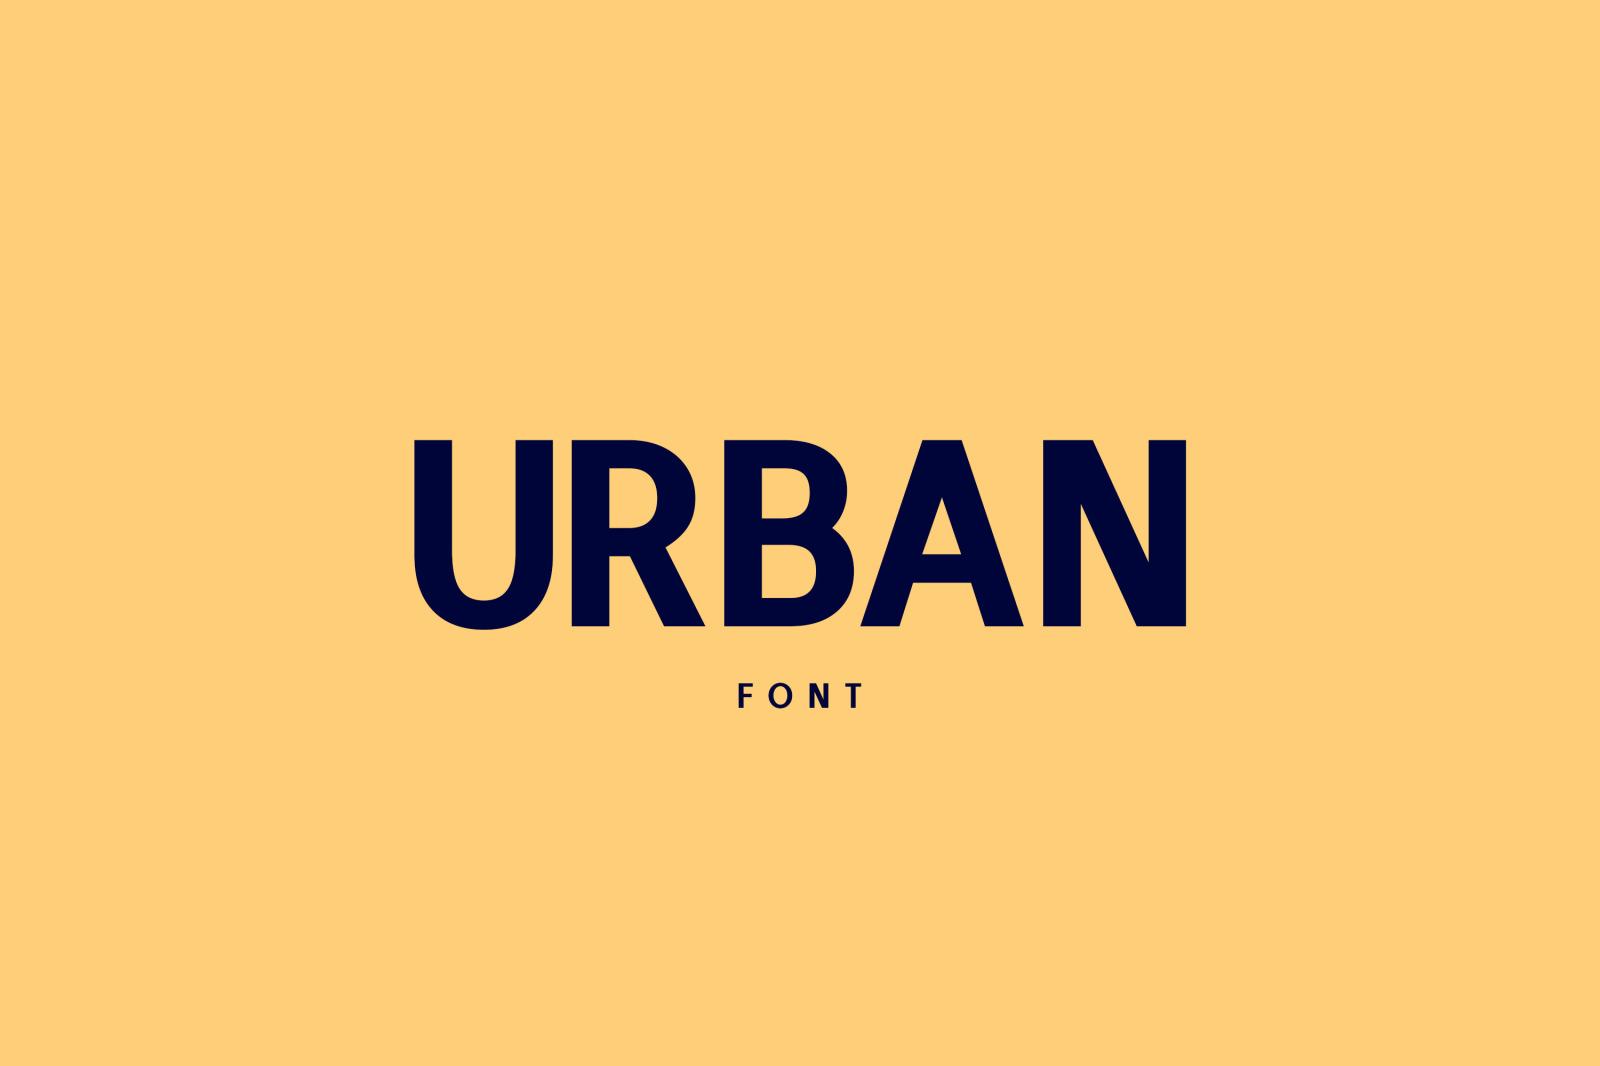 Urban Font